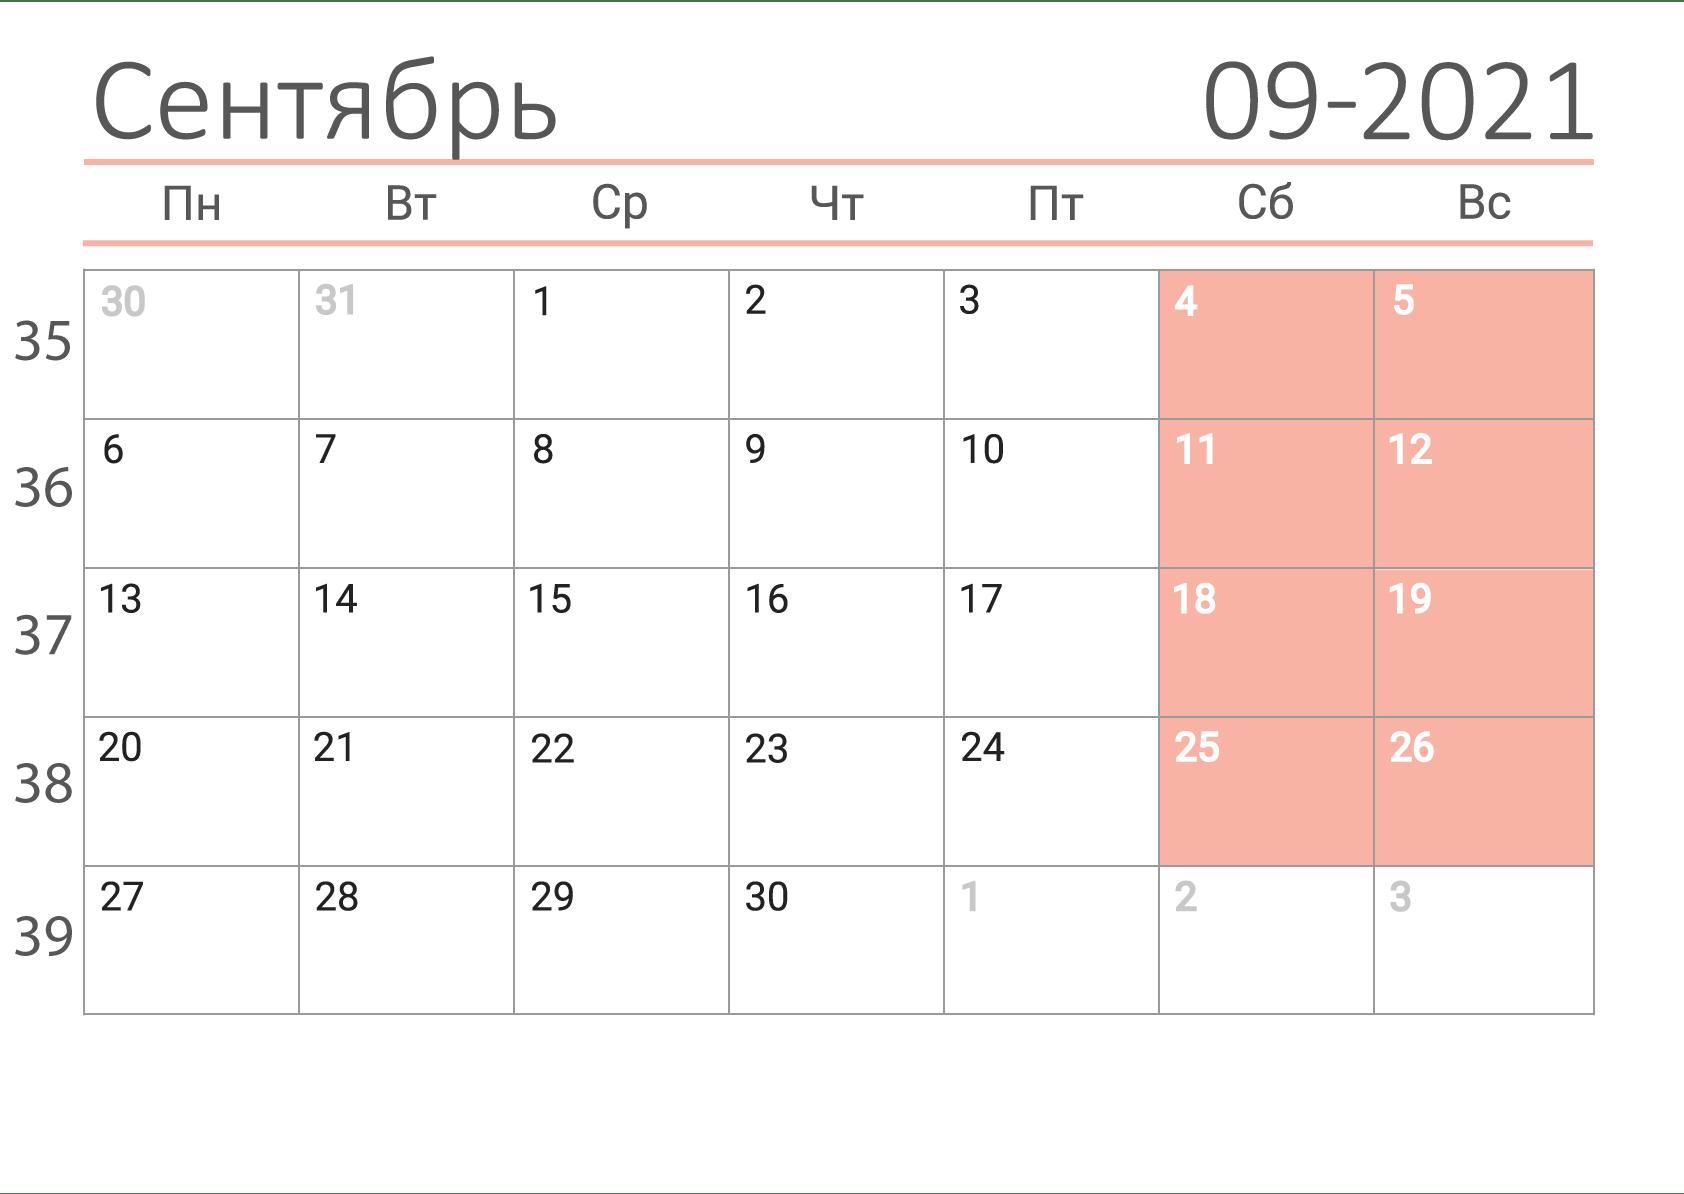 Сентябрь 2021 - Календарь-сетка